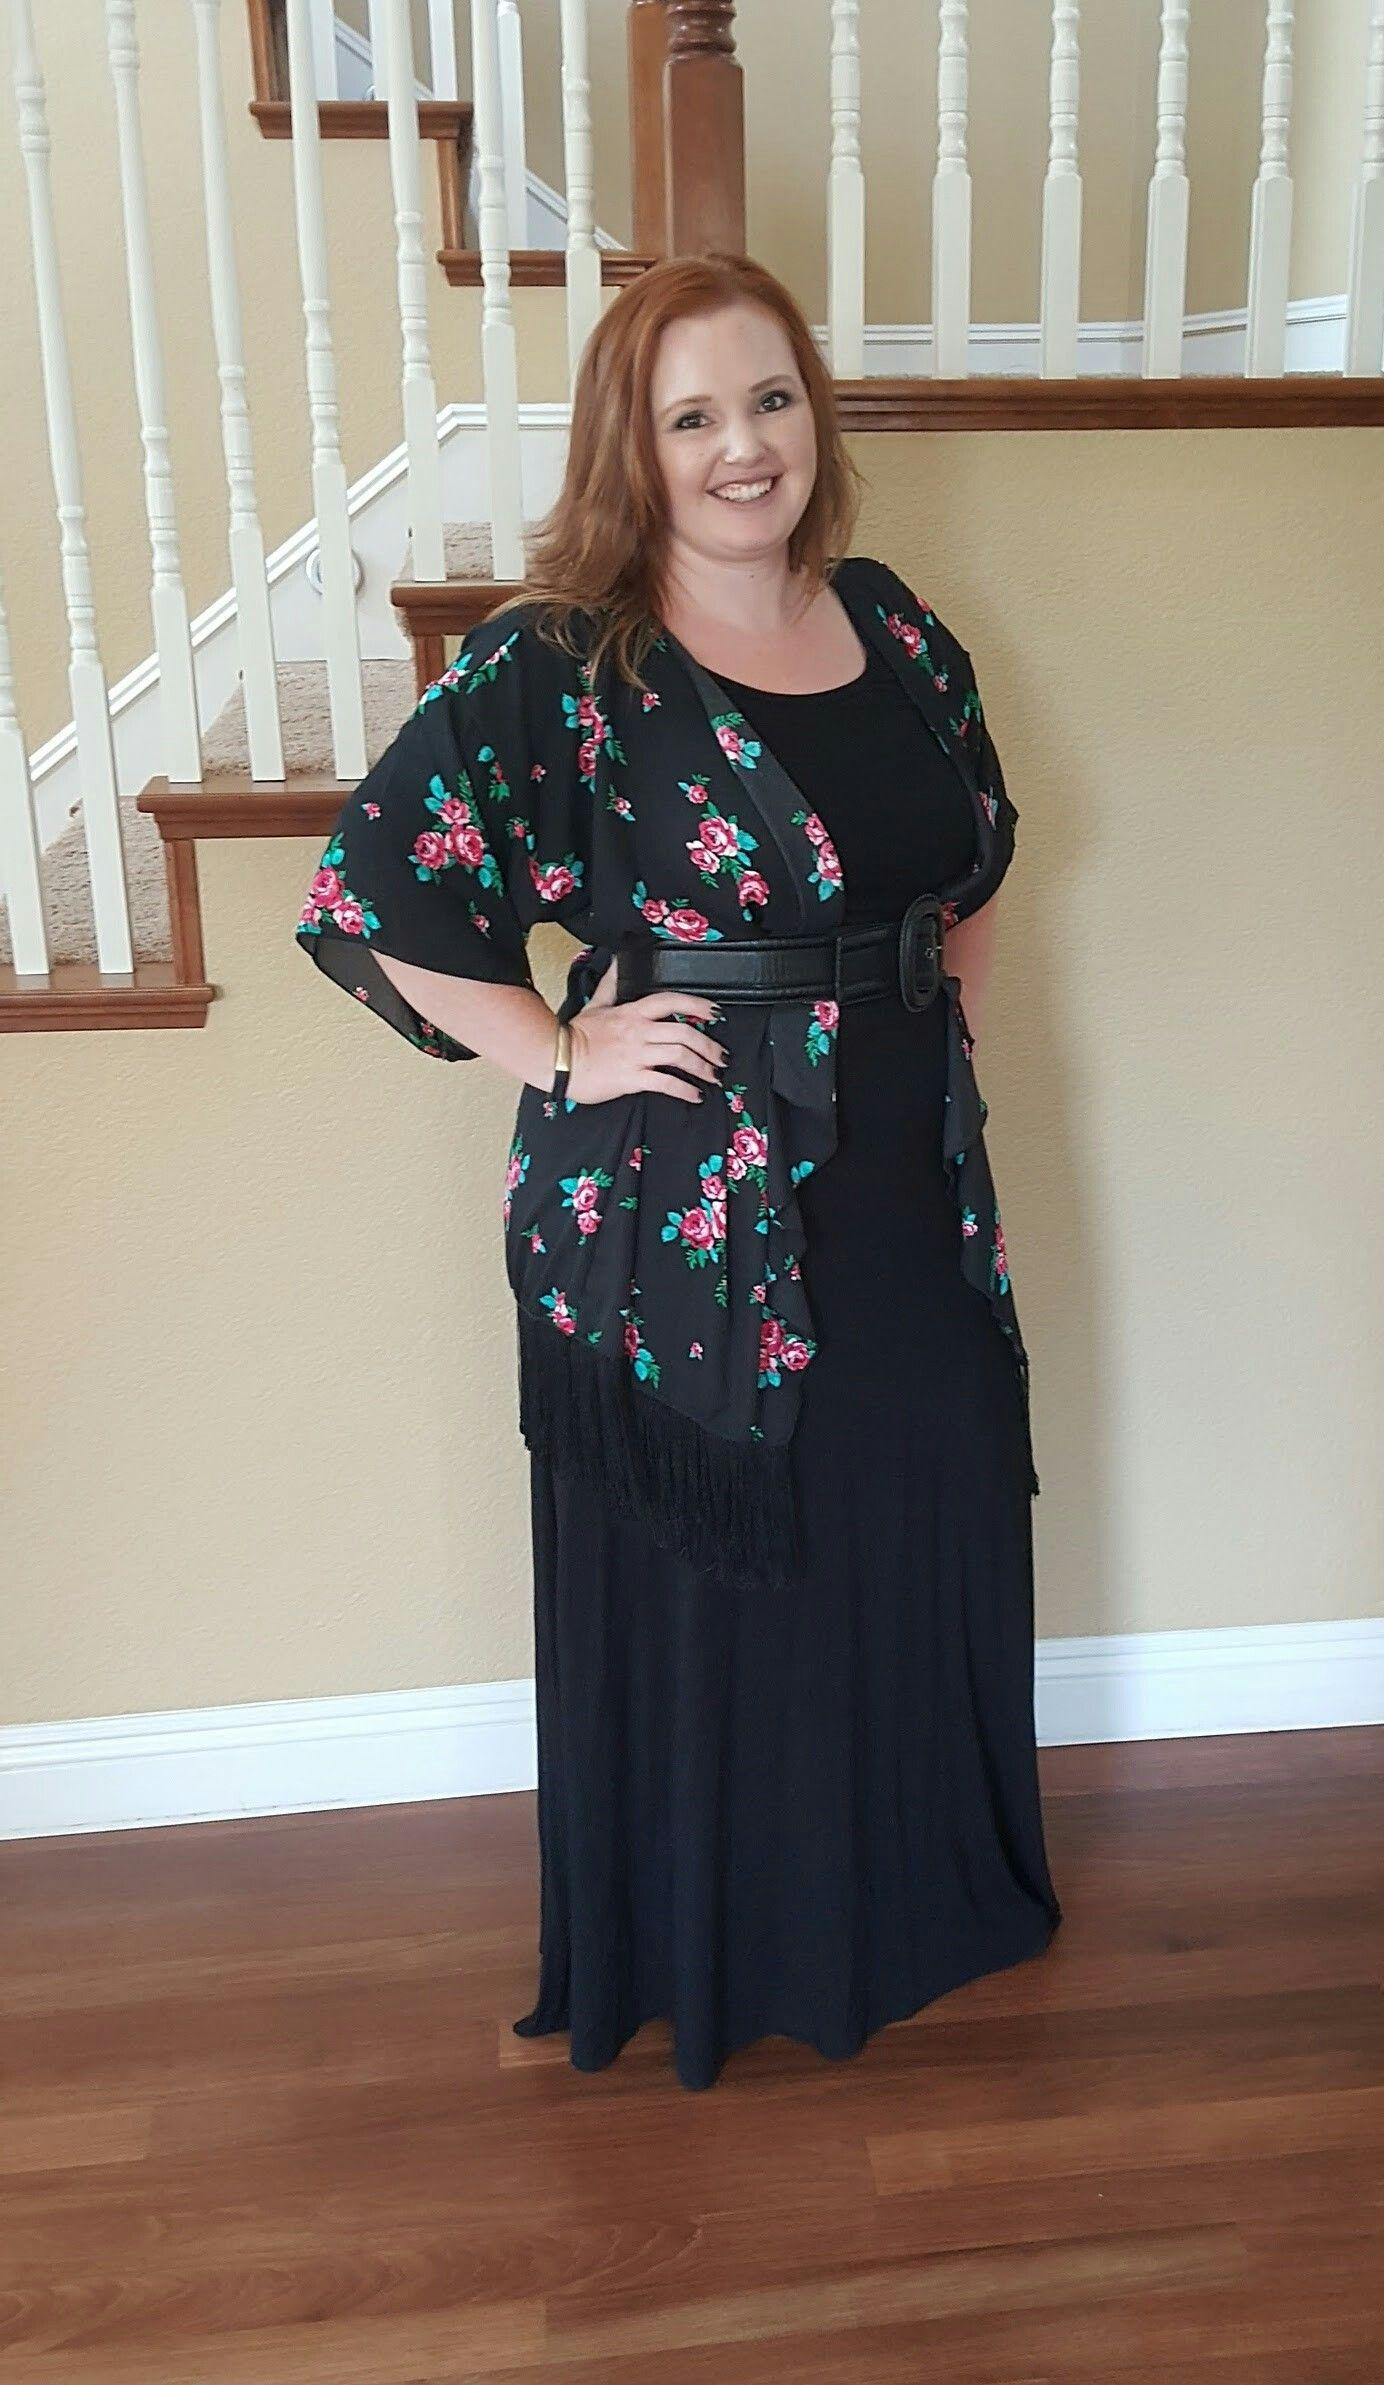 Lularoe Ana dress with a beautiful floral Monroe!  https://www.facebook.com/groups/SarahDamonteLuLaRoe/?pnref=story